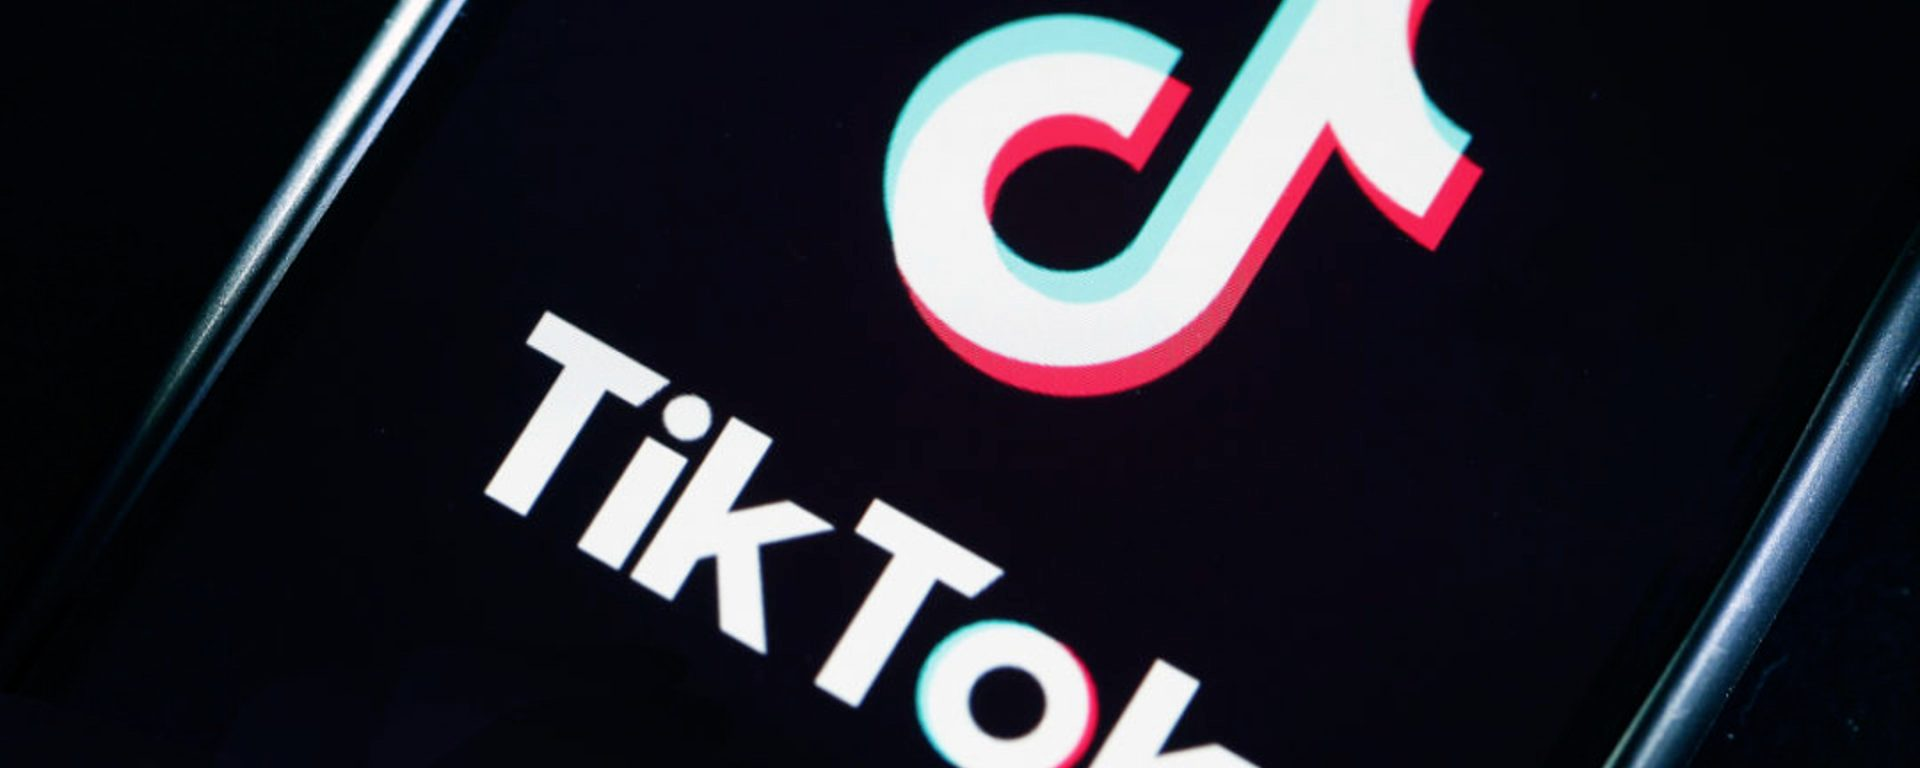 TikTok_Branding_-_Feature_image_1920x1280